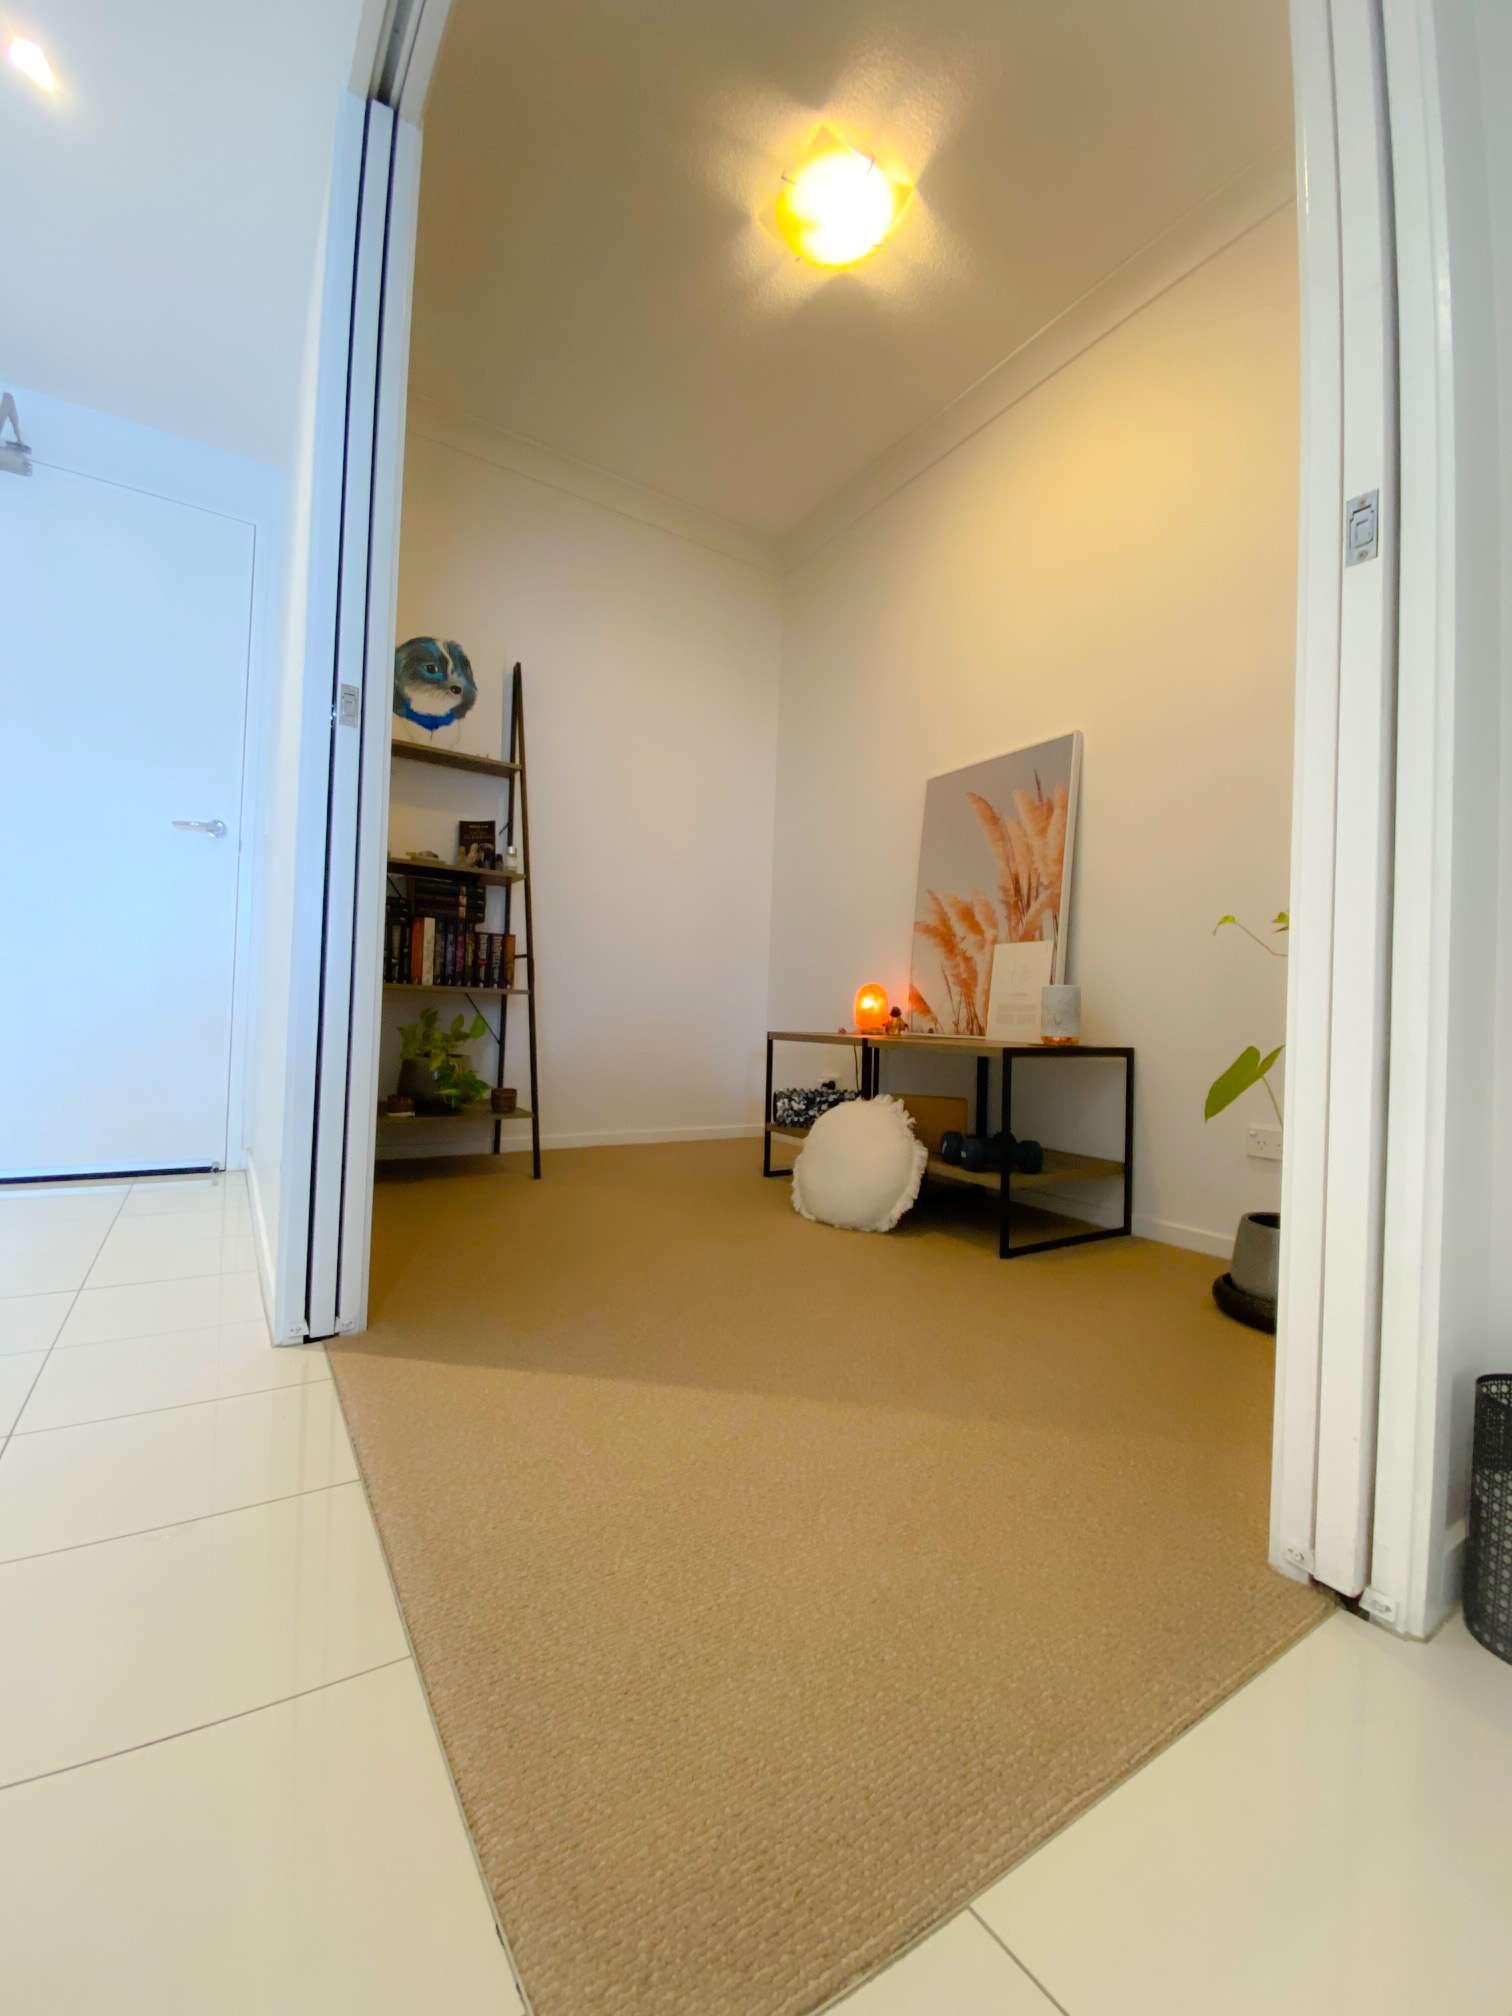 110/2 East Quay Drive, Biggera Waters, QLD 4216